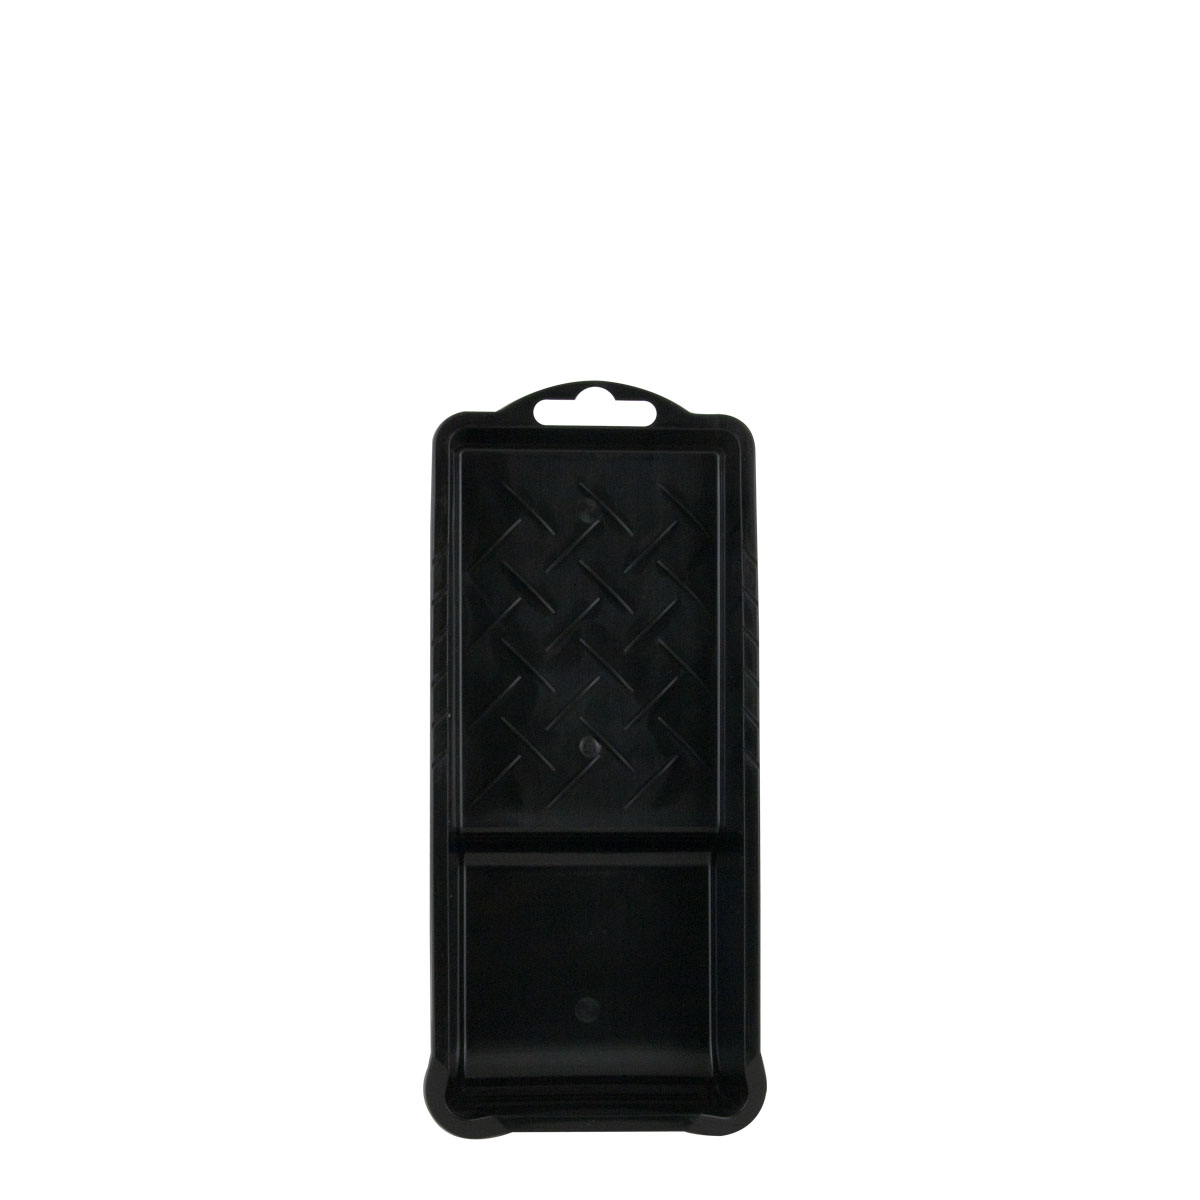 Farbklecks24 Farbwanne Kunststoff, schwarz, Lackwanne, 10 x 22cm